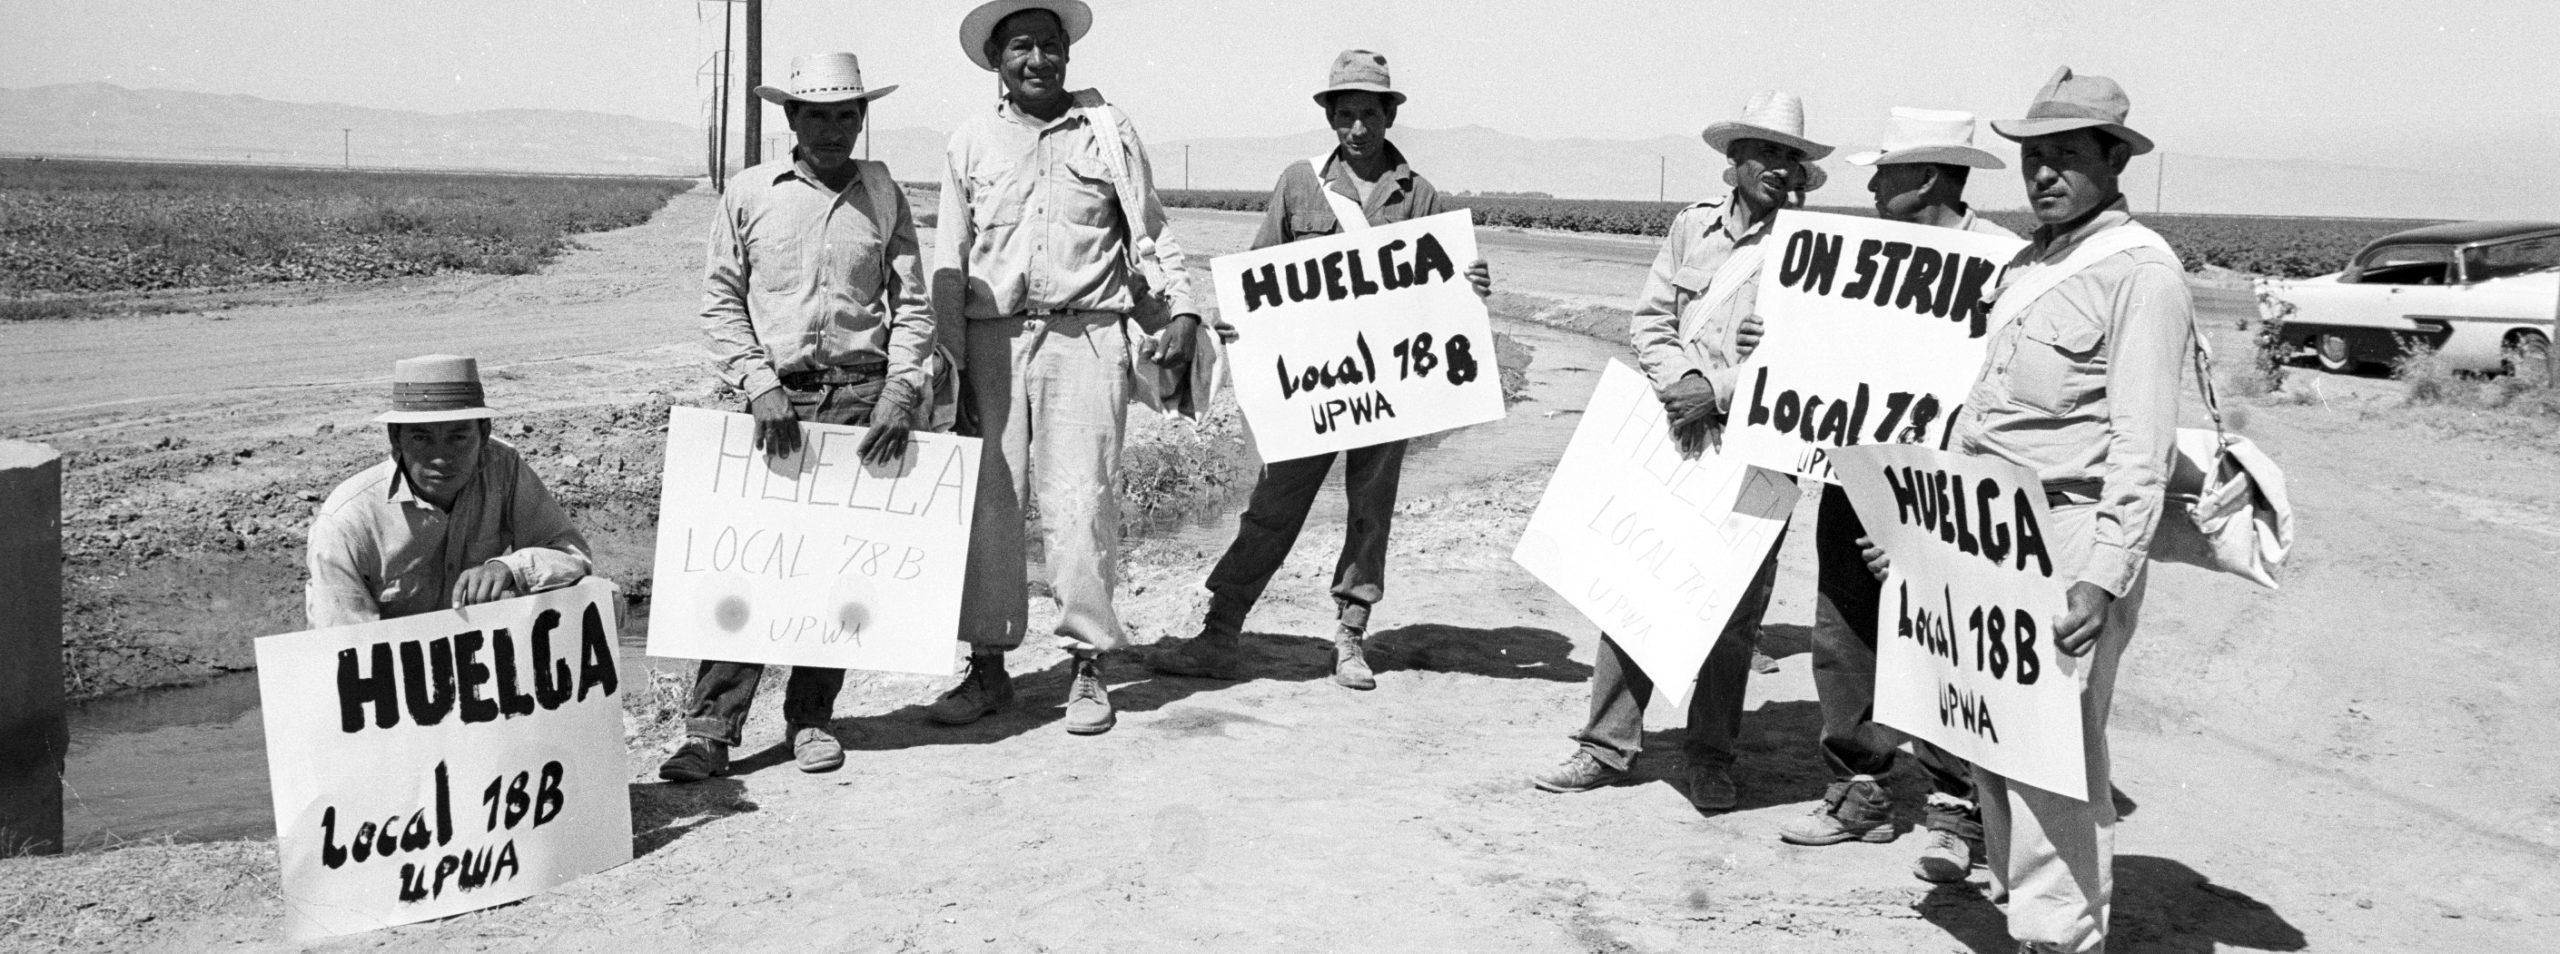 July, 1962, Fresno County, CA